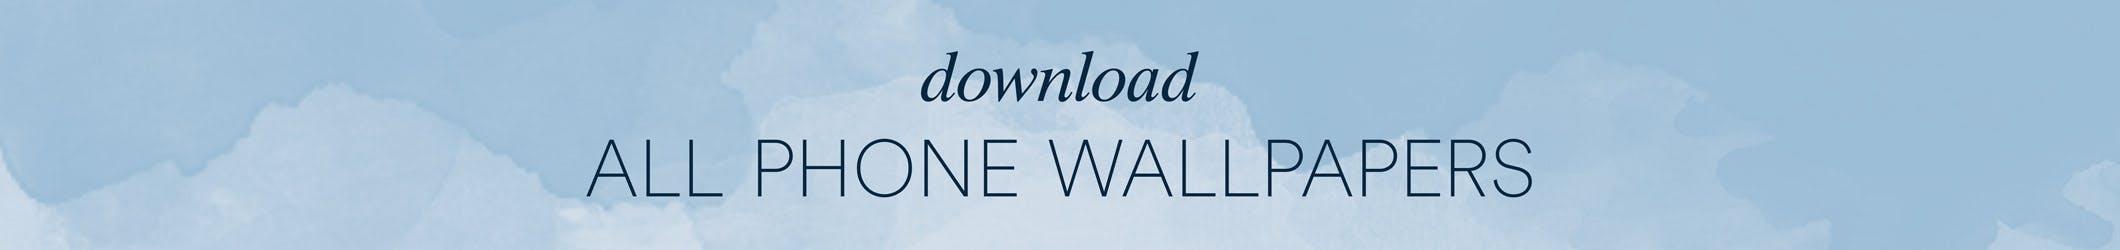 download iphone wallpapers